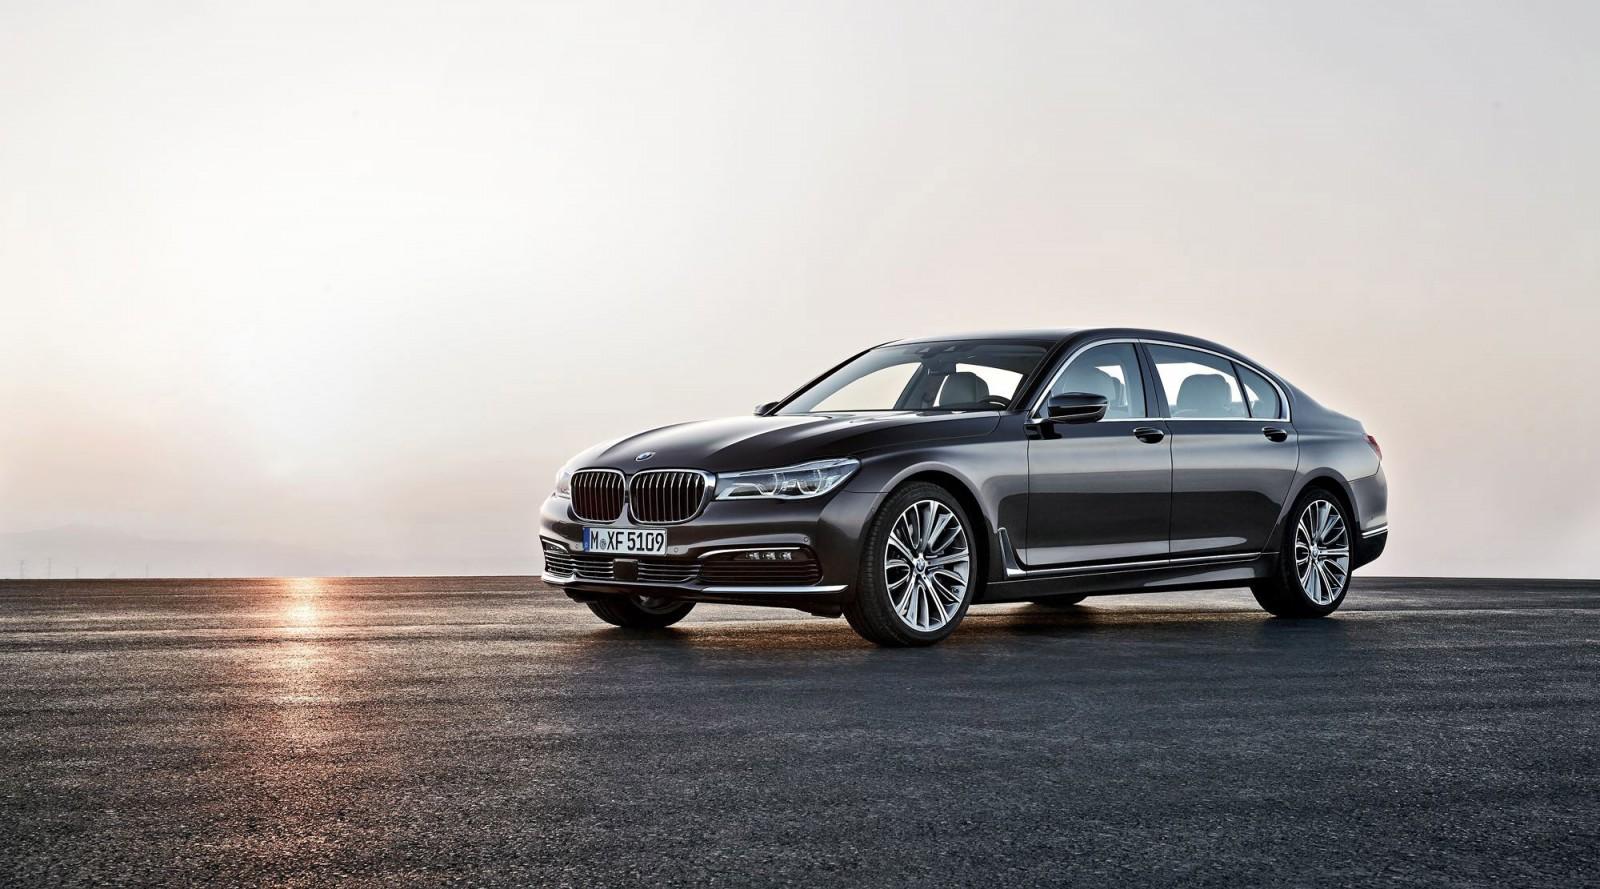 2016 BMW 750 Exterior Photos 10